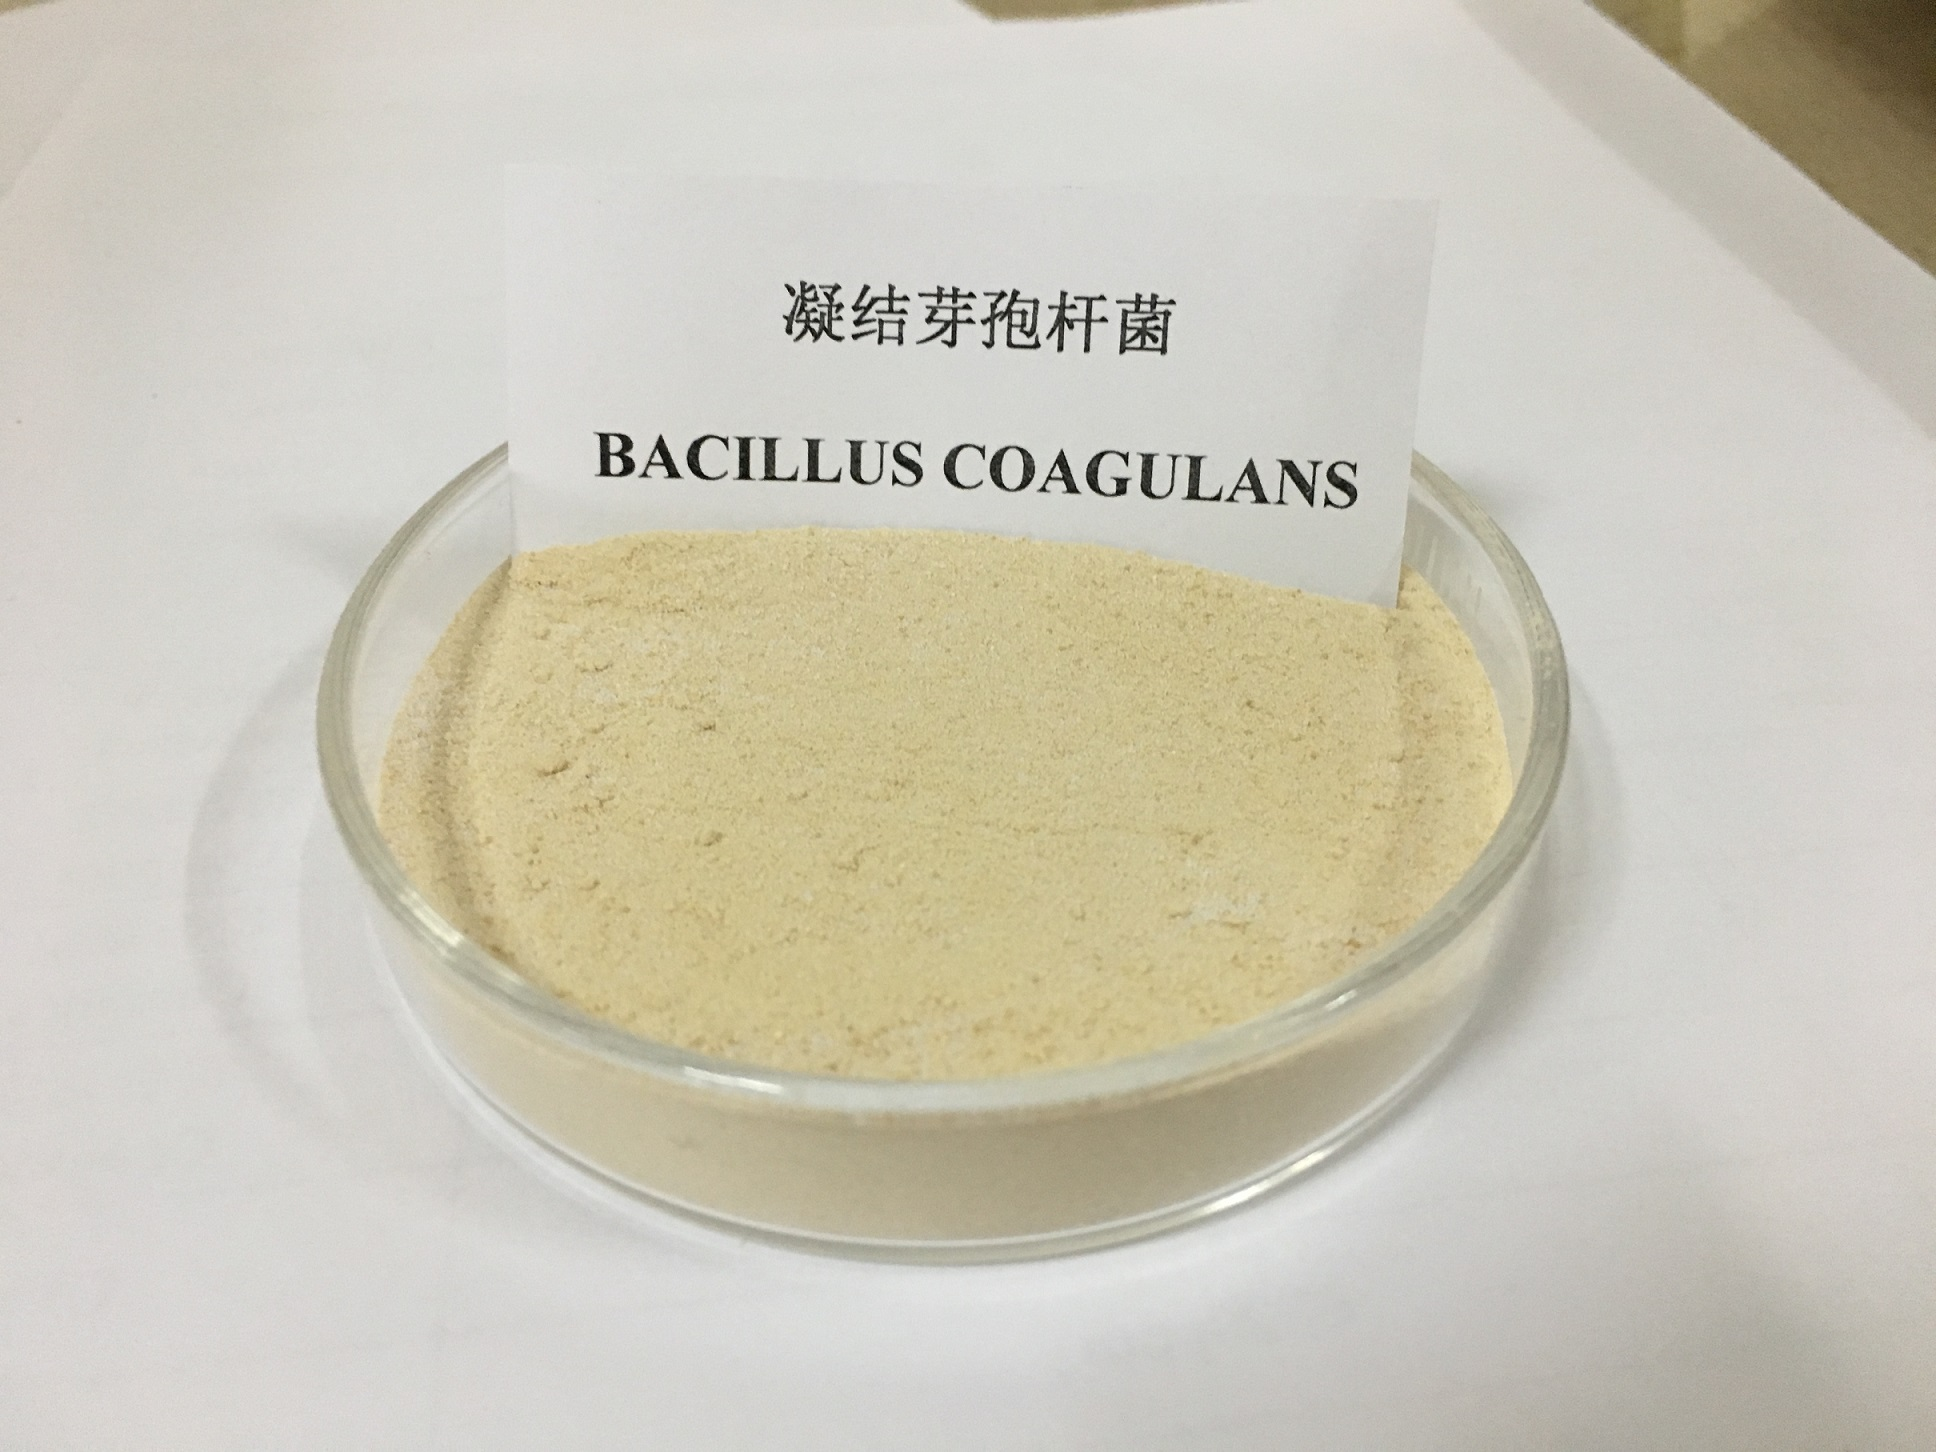 Food Additive Bacillus Coagulans to Promote Digestion High Content Bacillus Coagulans Probiotic